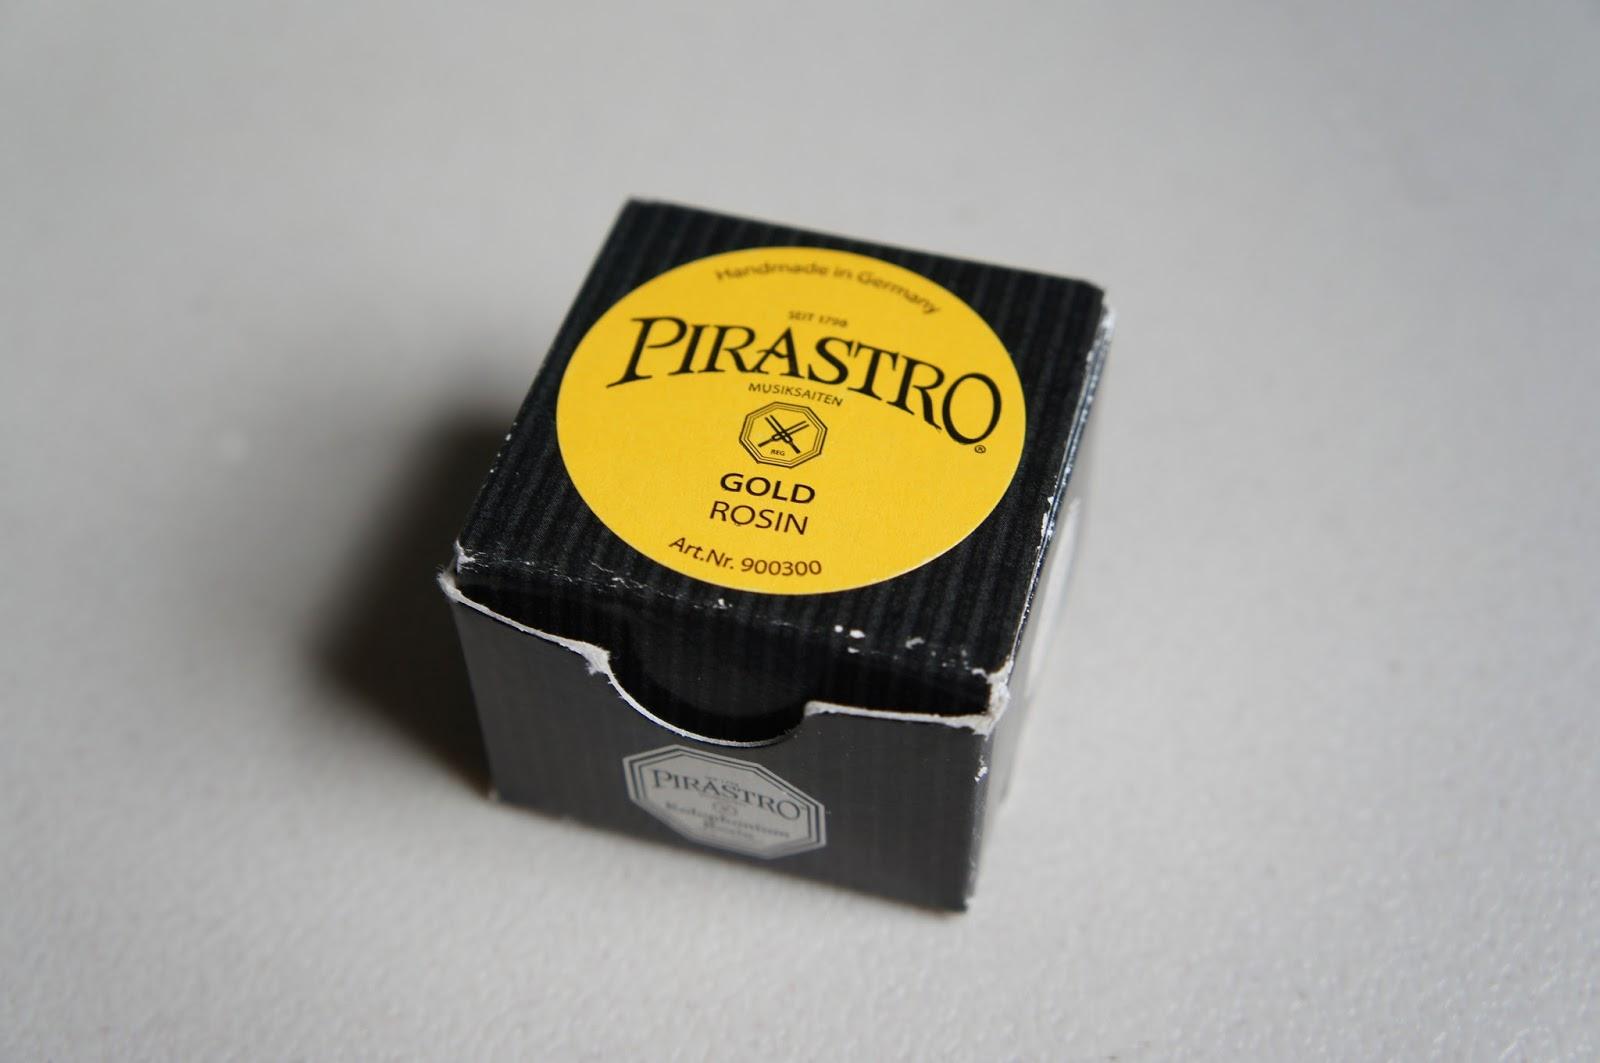 pirastro rosin how to use